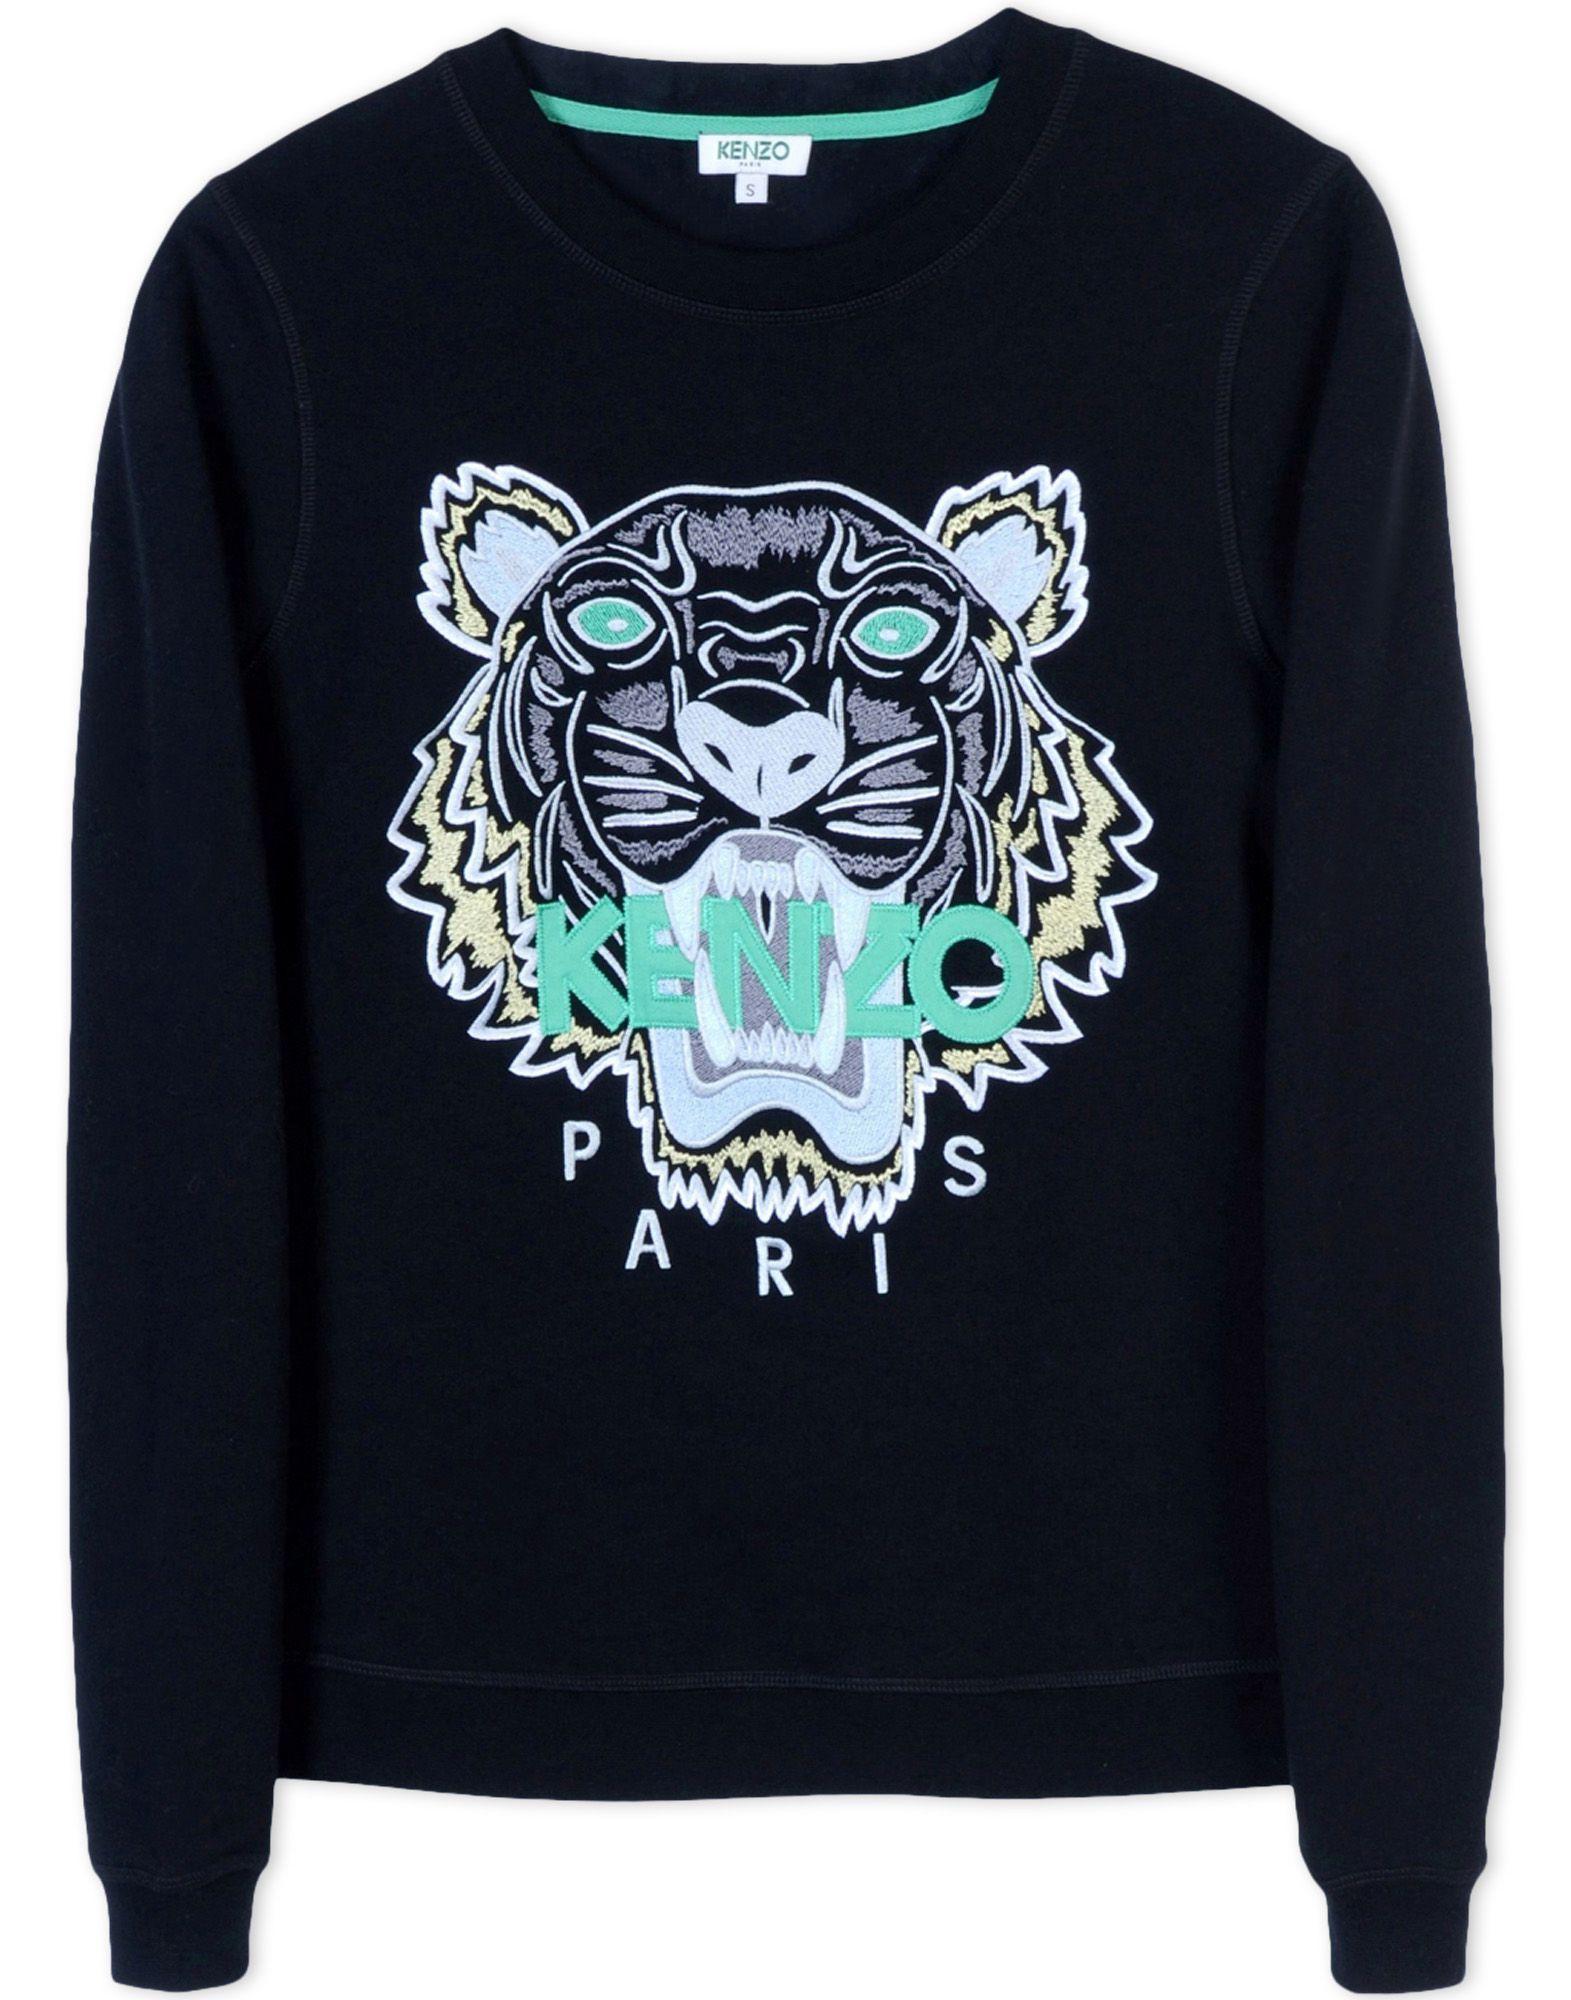 Kenzo Kenzo Mujer Thecorner Com Sweatshirts Kenzo Sweatshirt Black Cotton Sweatshirt [ 2000 x 1571 Pixel ]